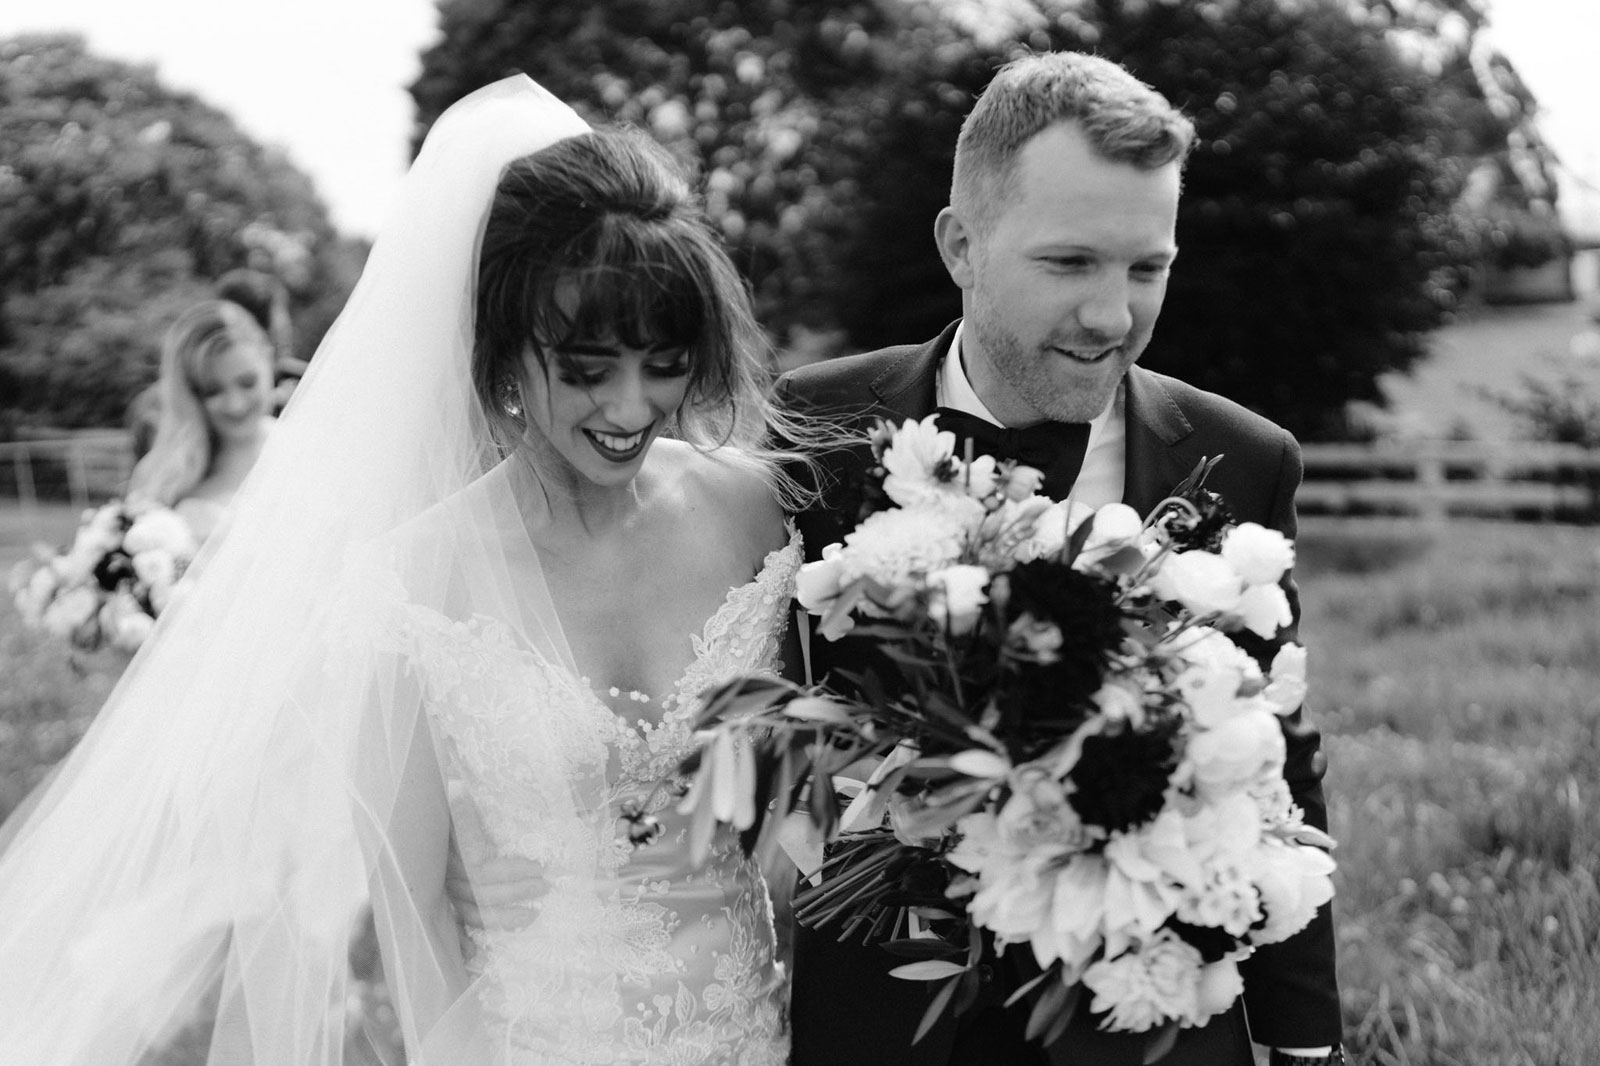 newfound-n-c-olive-tree-cottage-tauranga-wedding-photographer-608